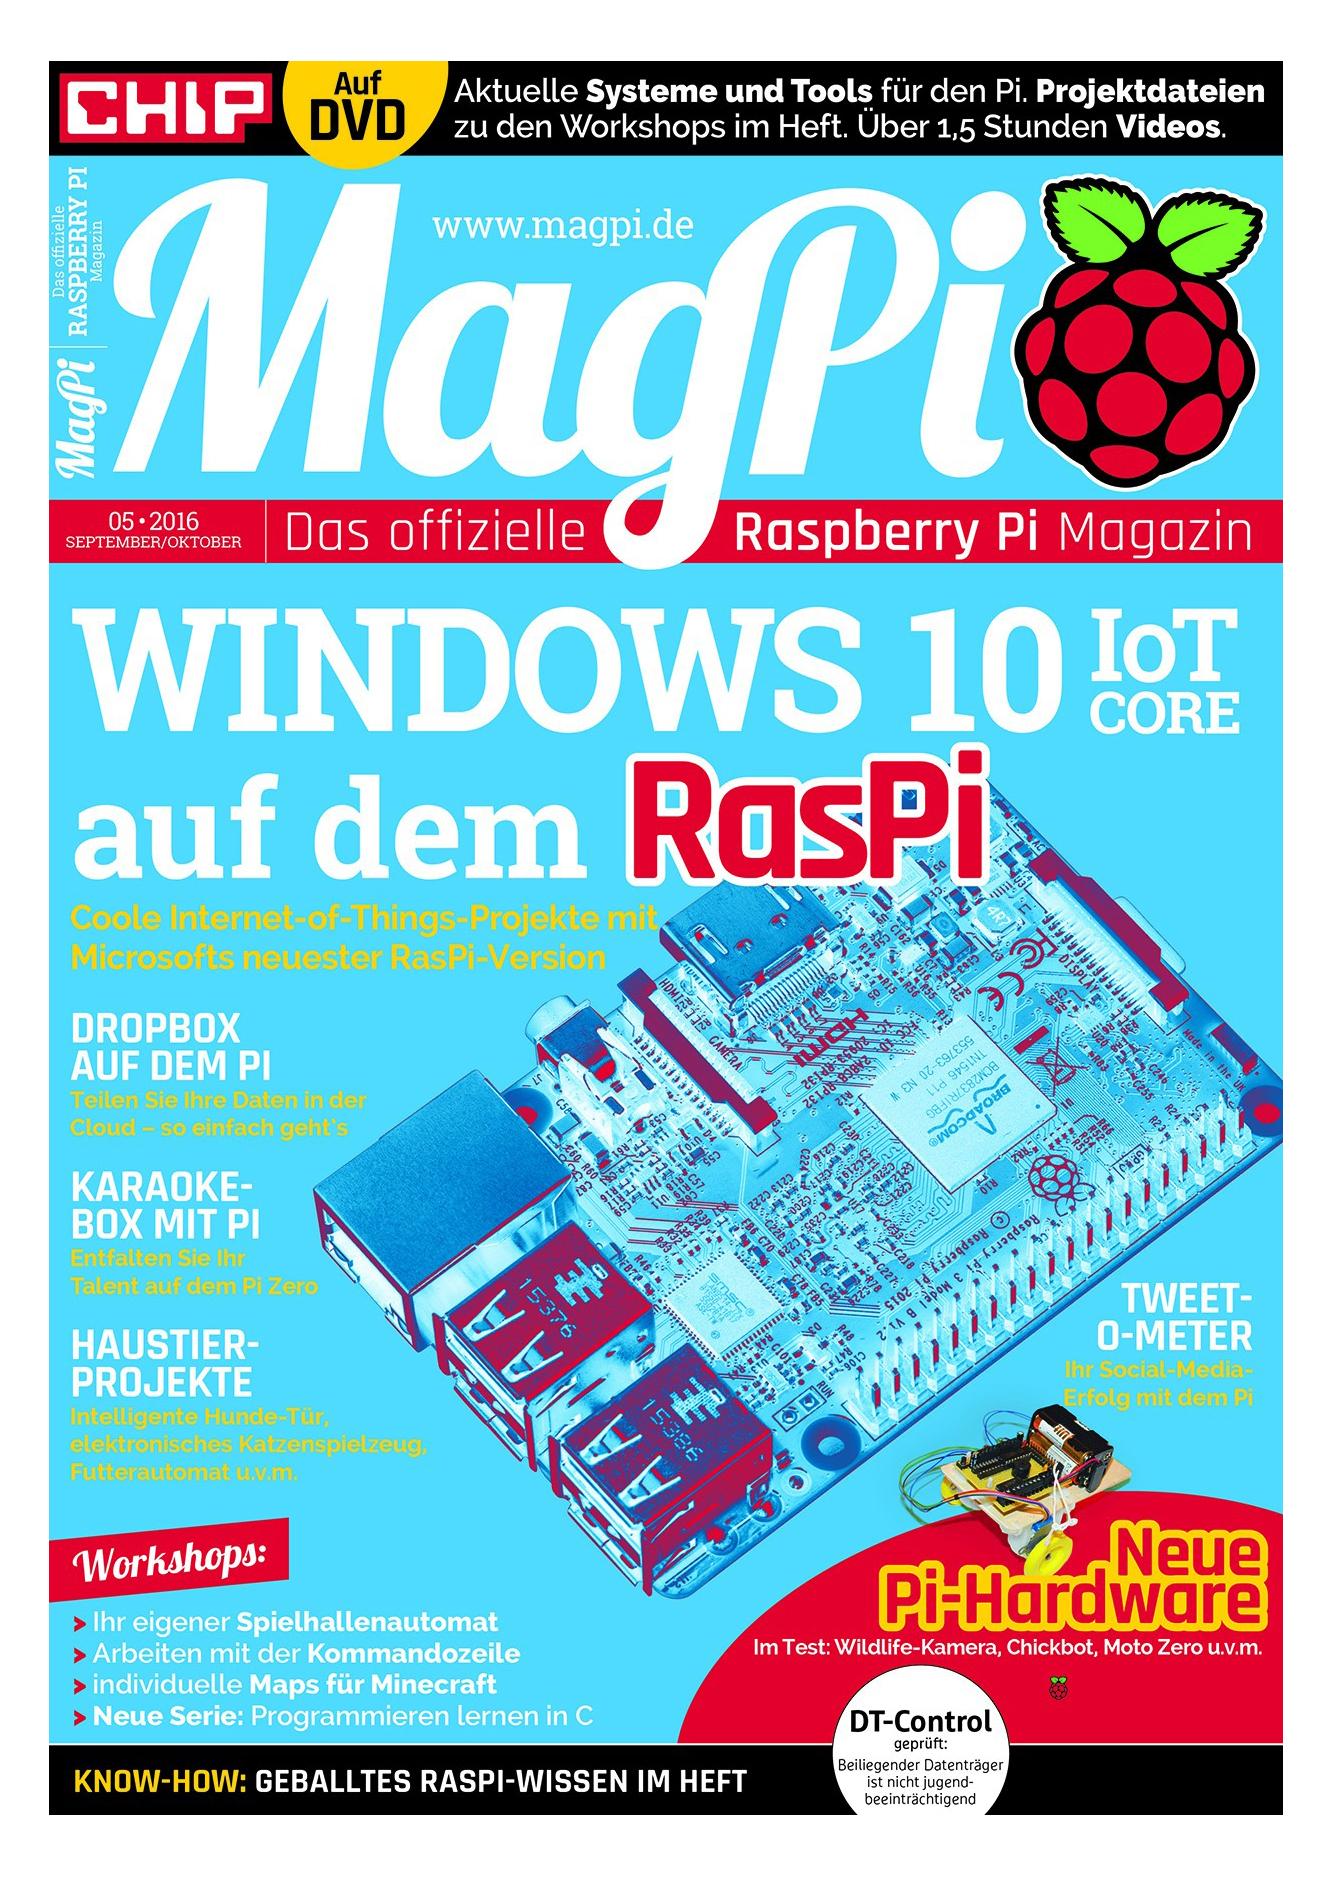 [Chip Adventskalender] MagPi Sonderheft - Vollversion (eBook)